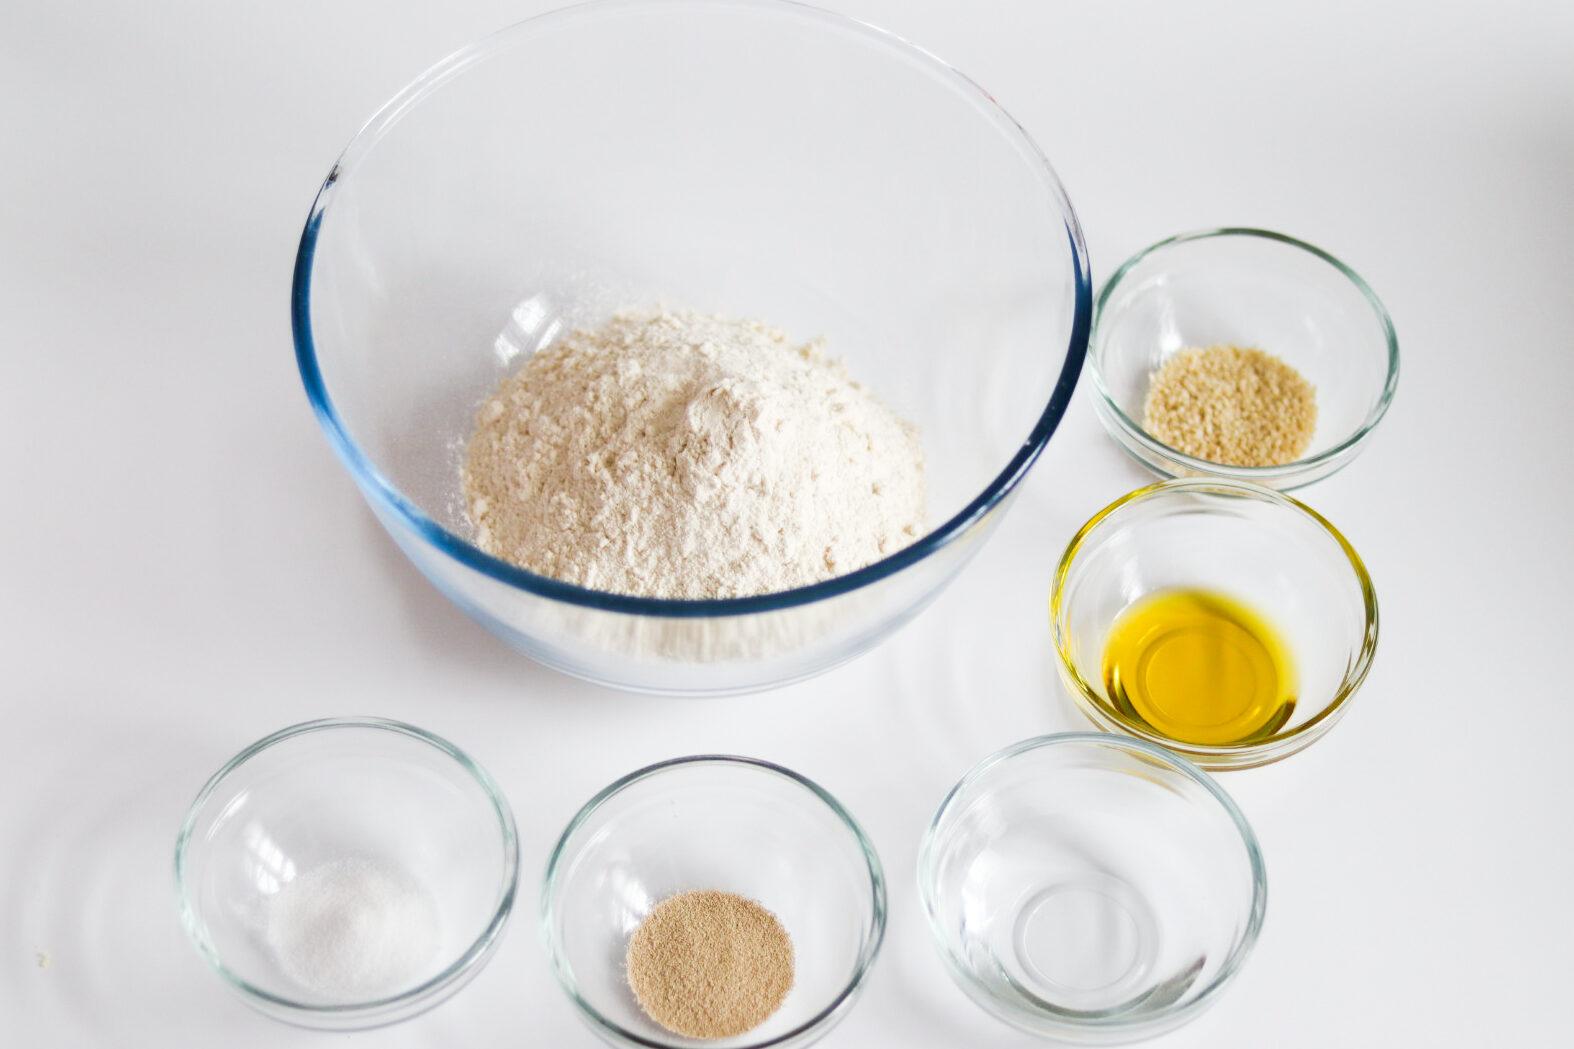 Breadsticks recipe ingredients.